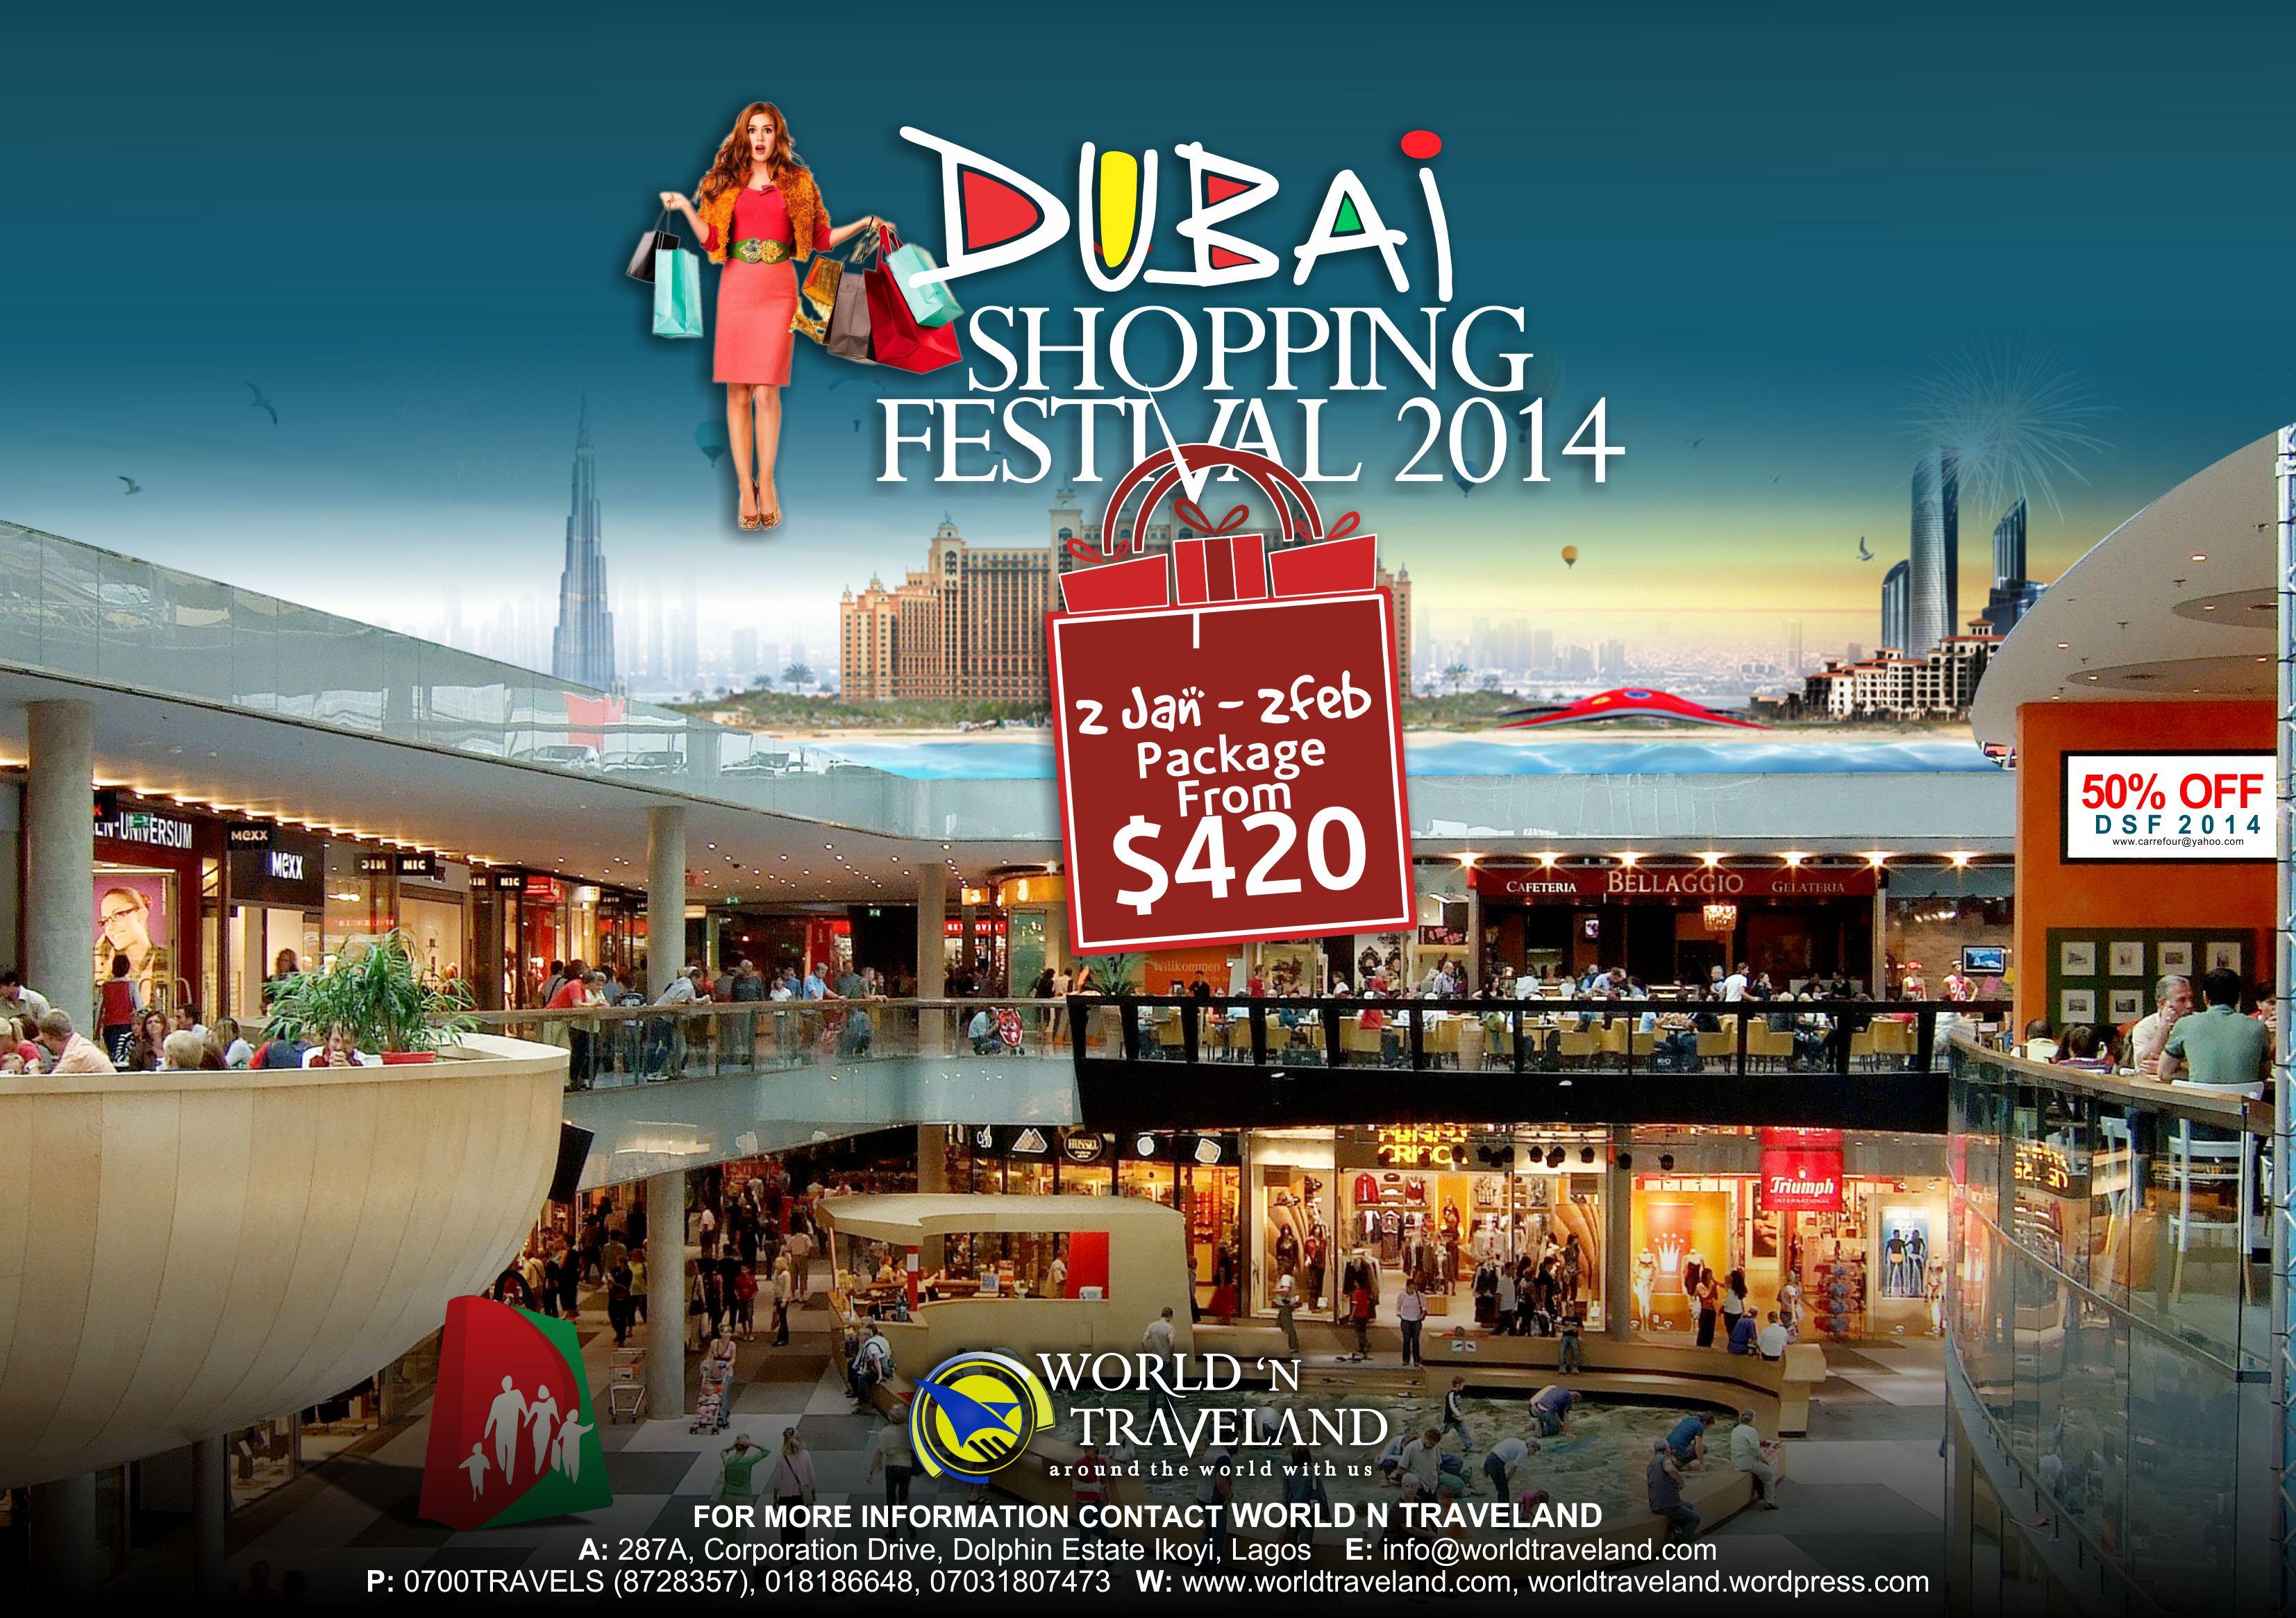 DUBAI SHOPPING FESTIVAL Ibiyinka J Famugbode